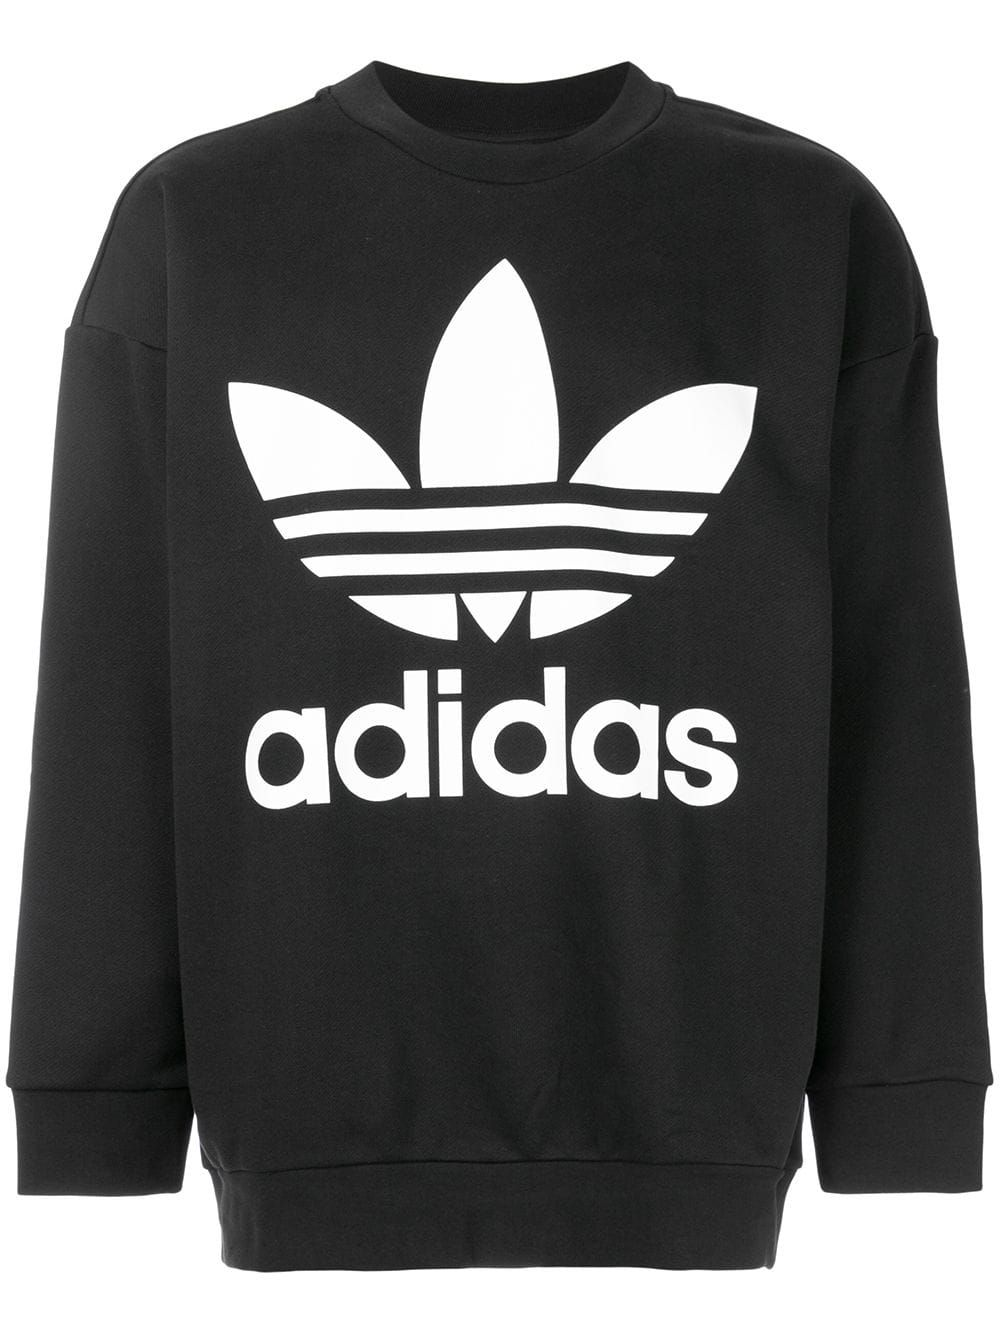 Adidas adidas Originals Oversized Sweatshirt With Trefoil